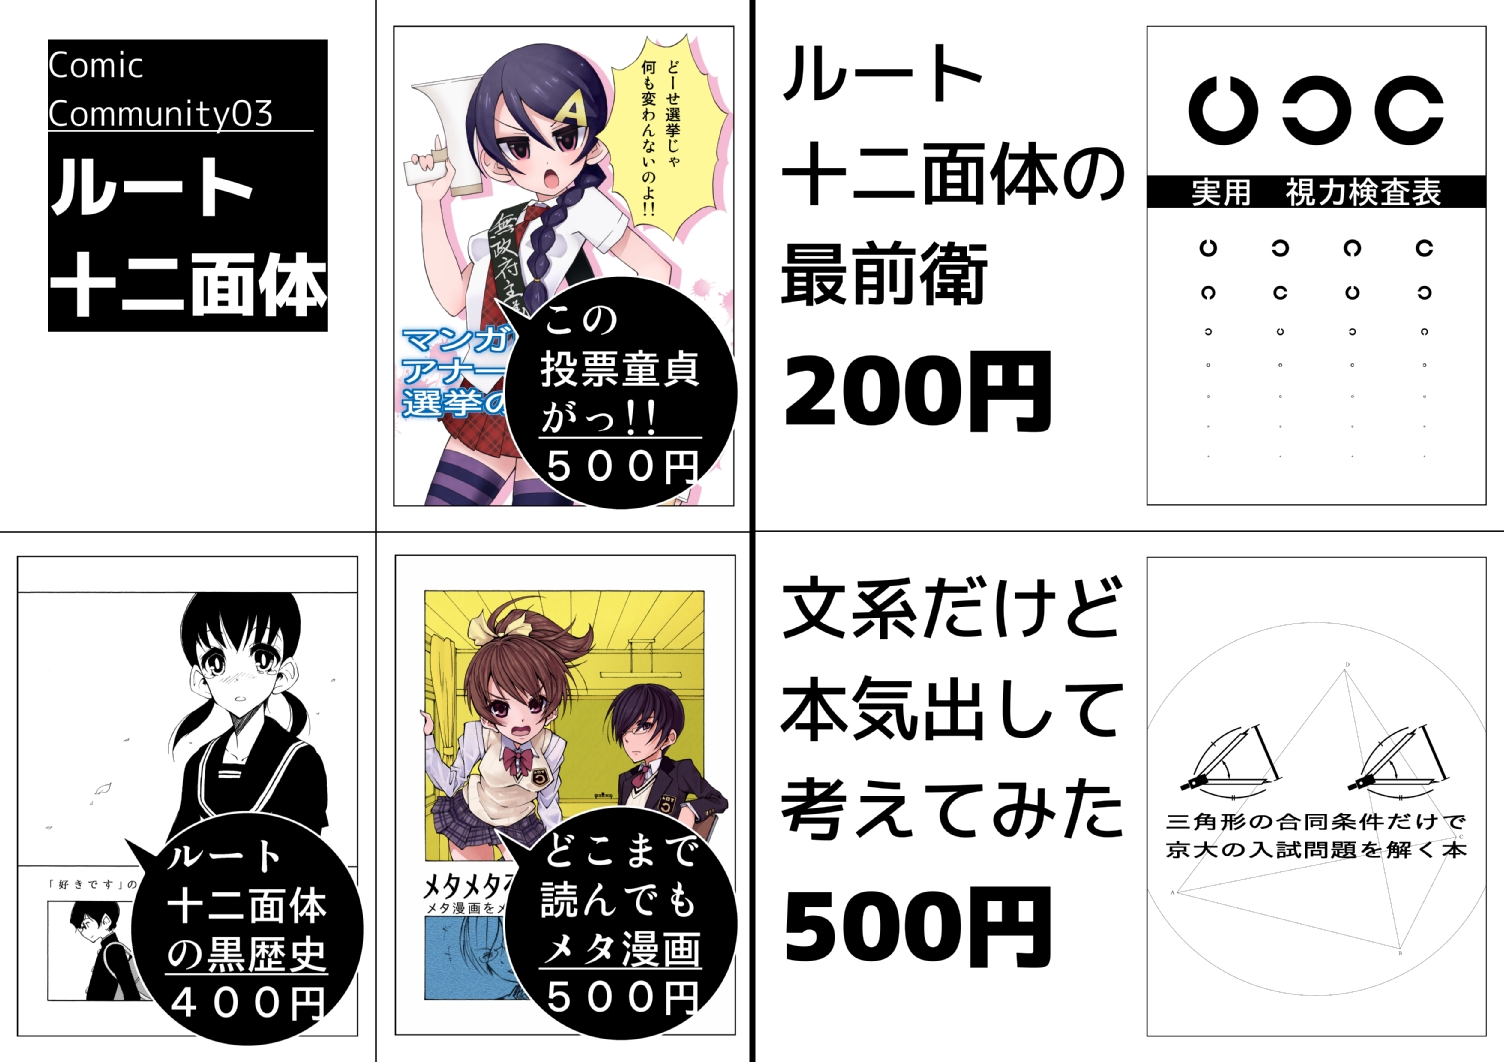 NF_CC03oshinagaki